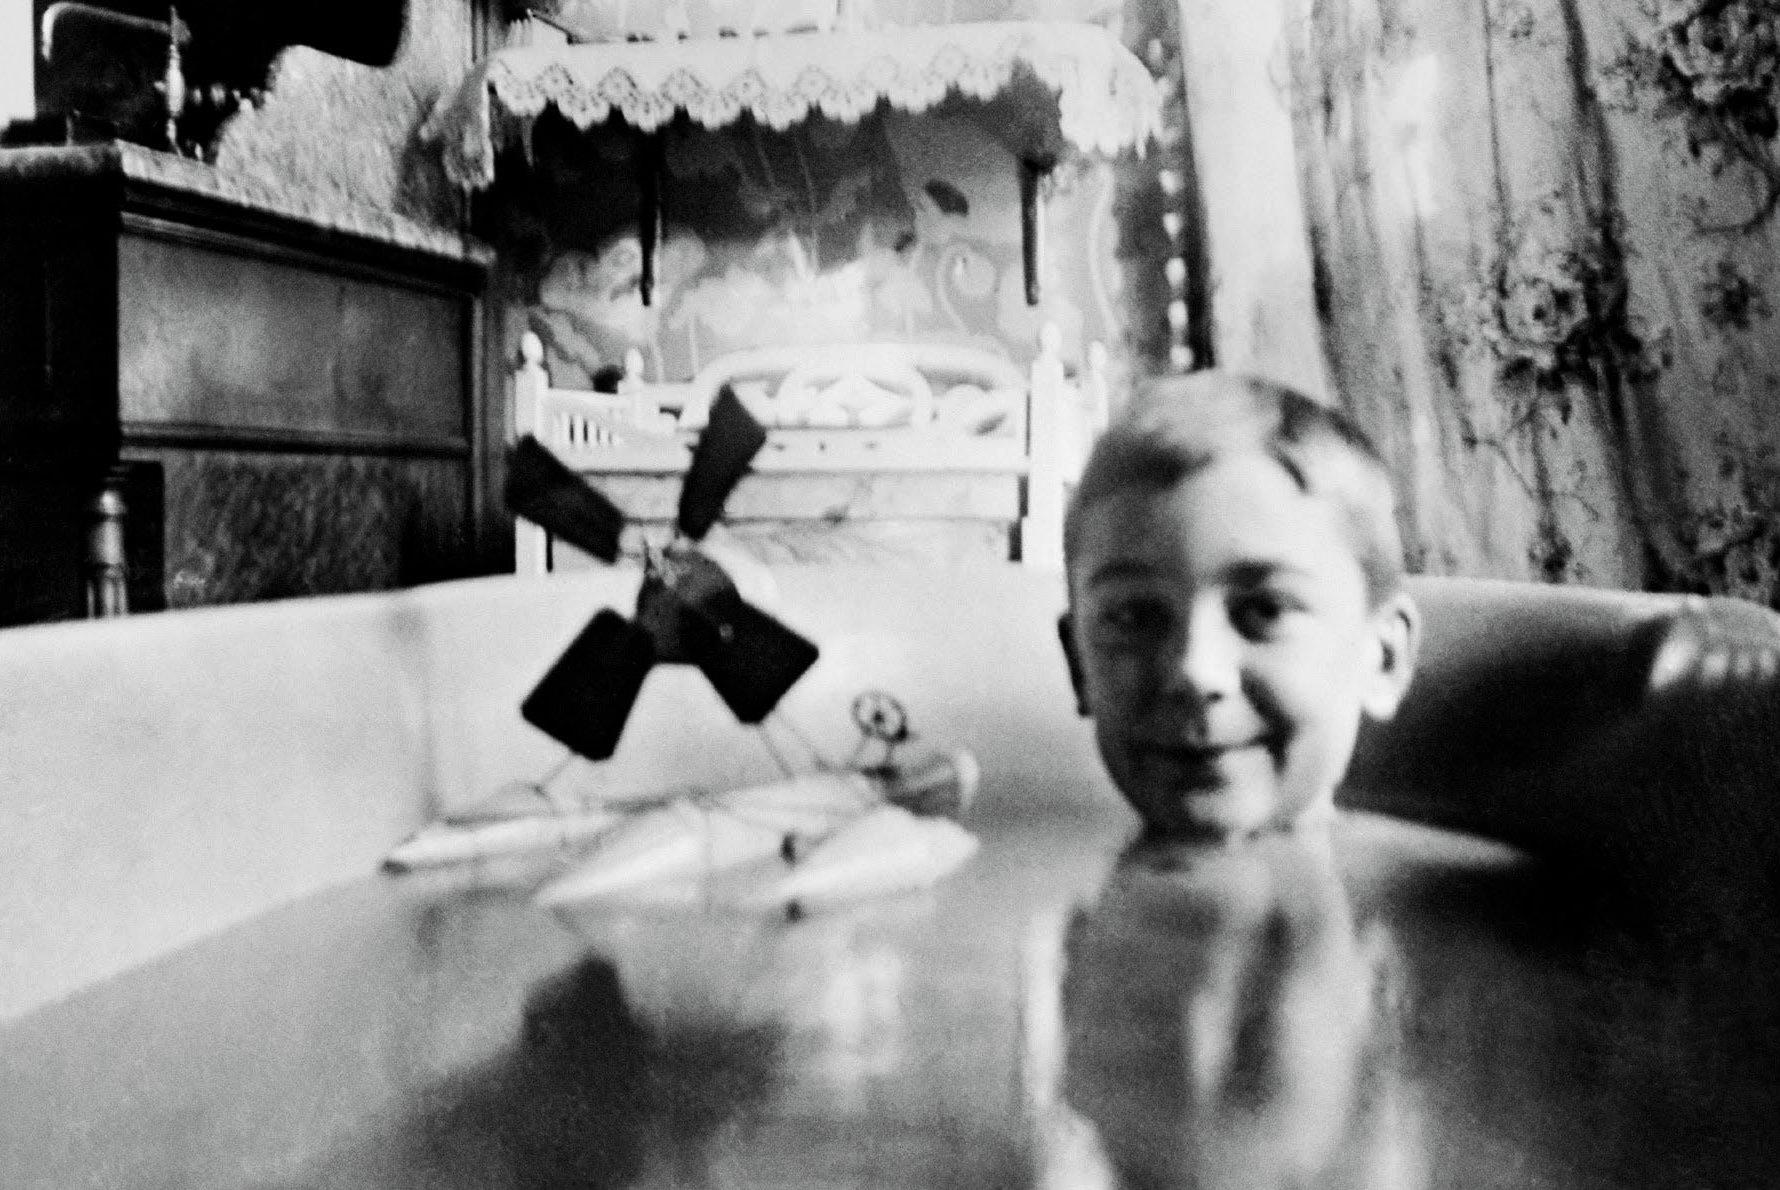 Jacques Henri Lartigue in his bath, 1904